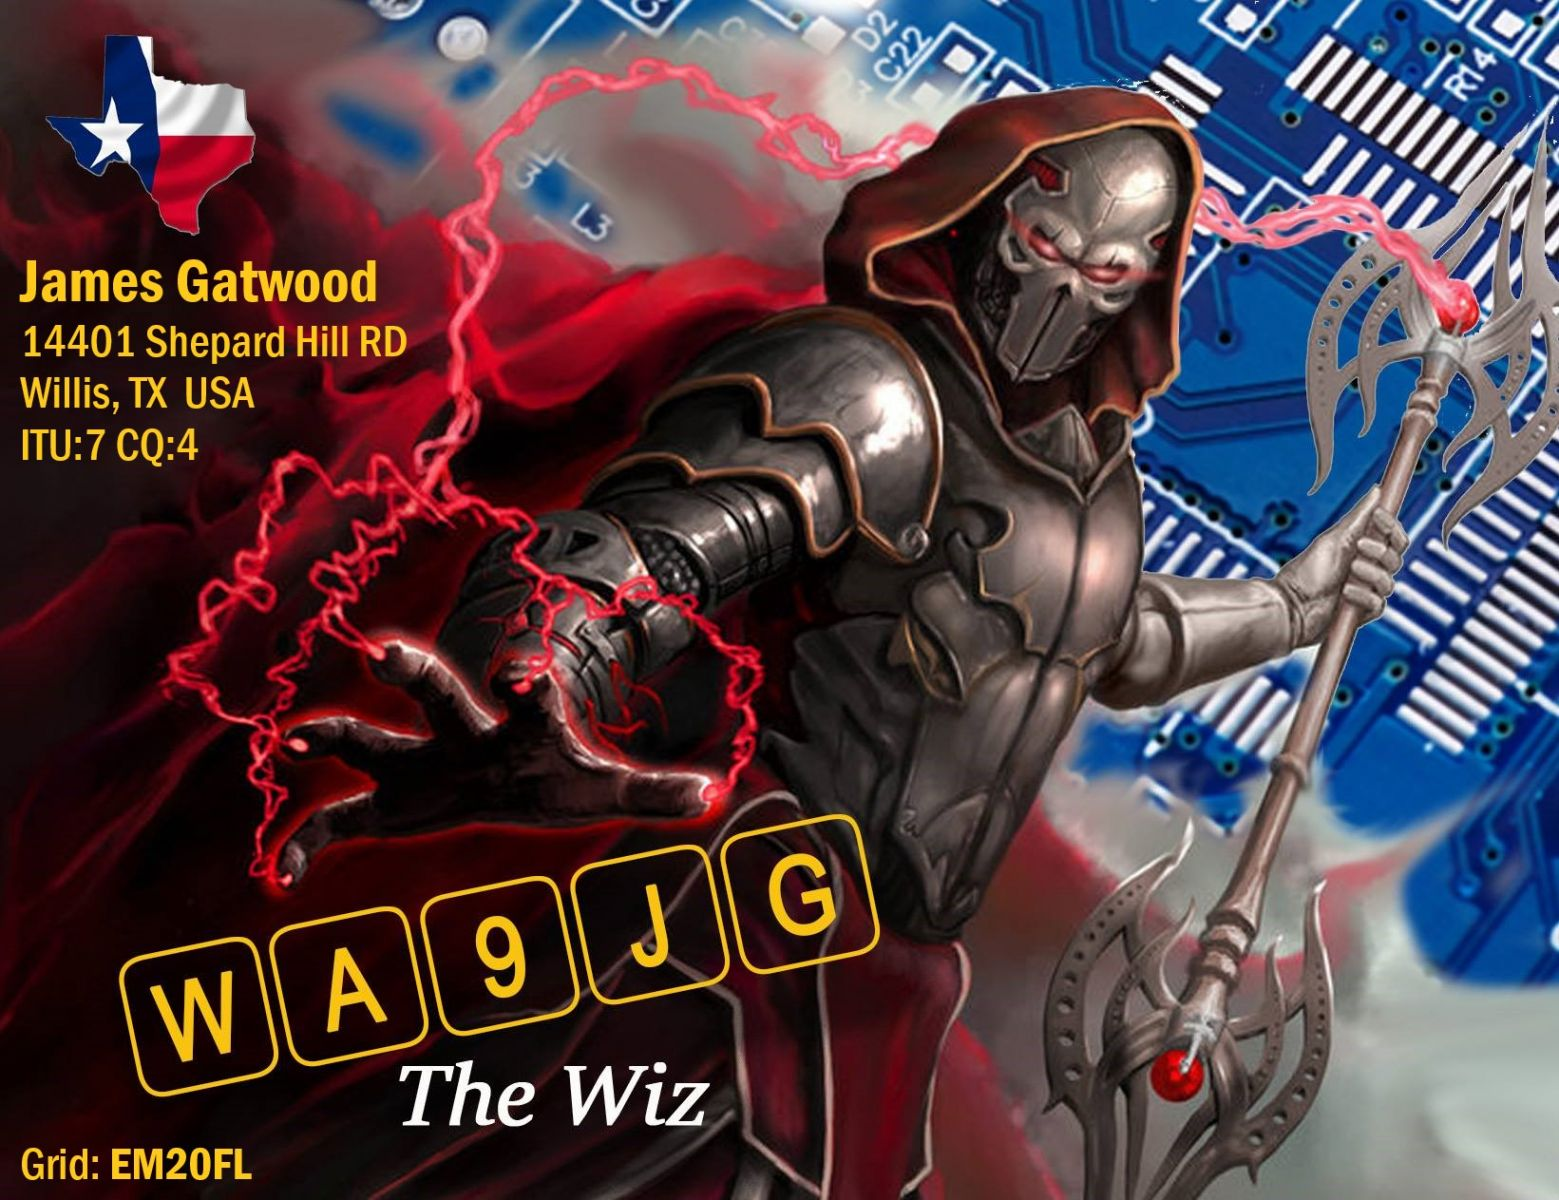 Primary Image for WA9JG